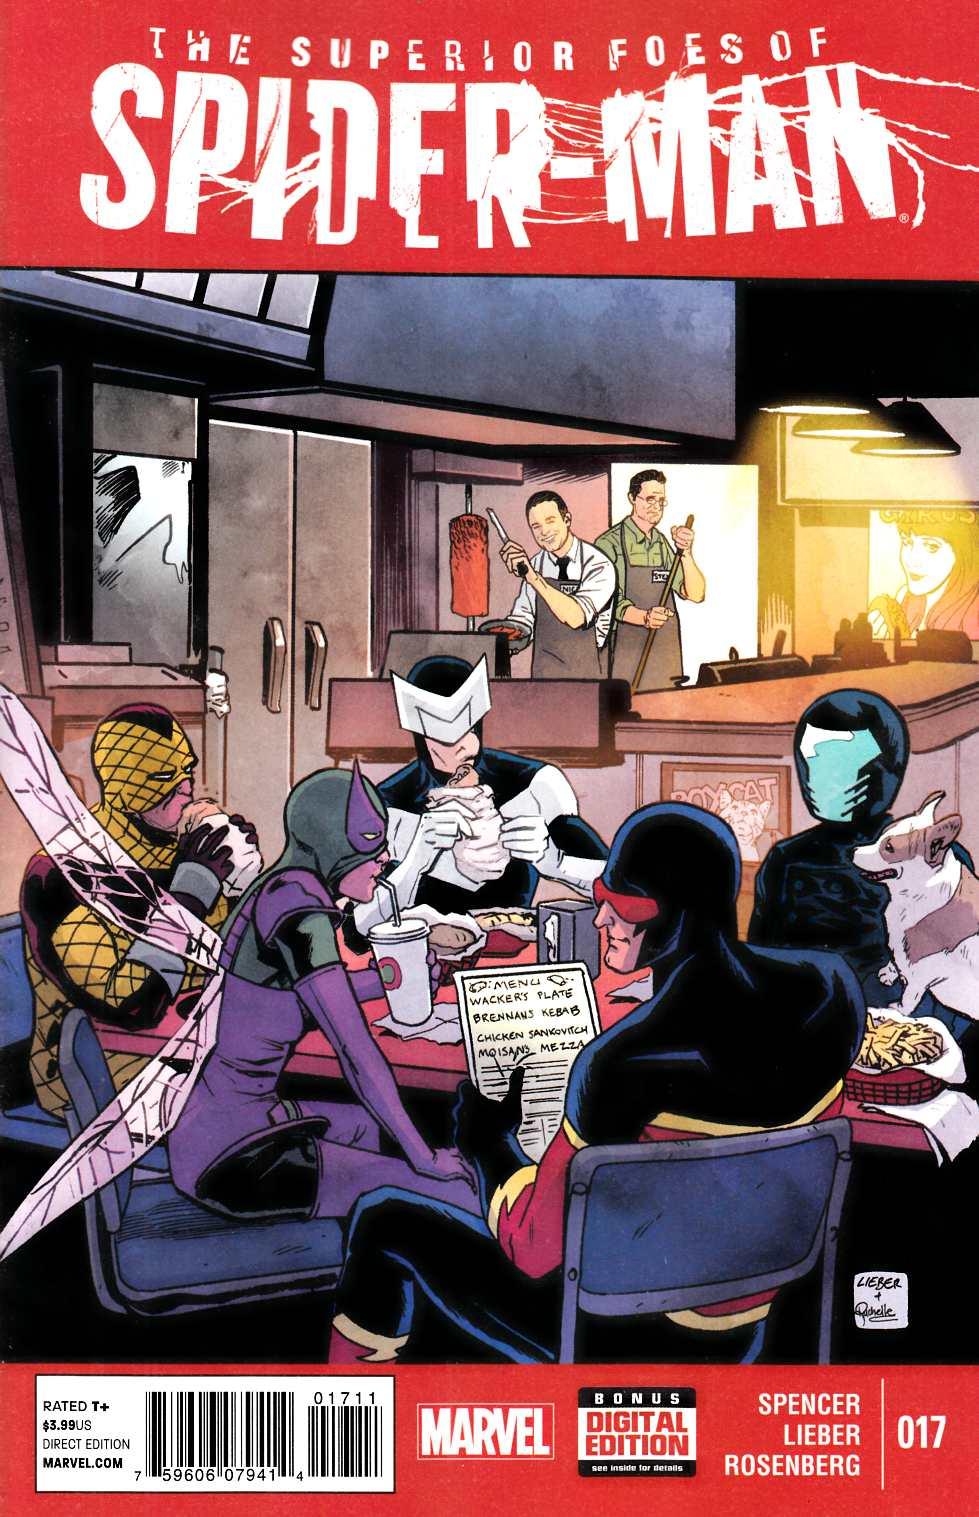 Superior Foes of Spider-Man #17 [Marvel Comic] – Dreamlandcomics.com Online  Store